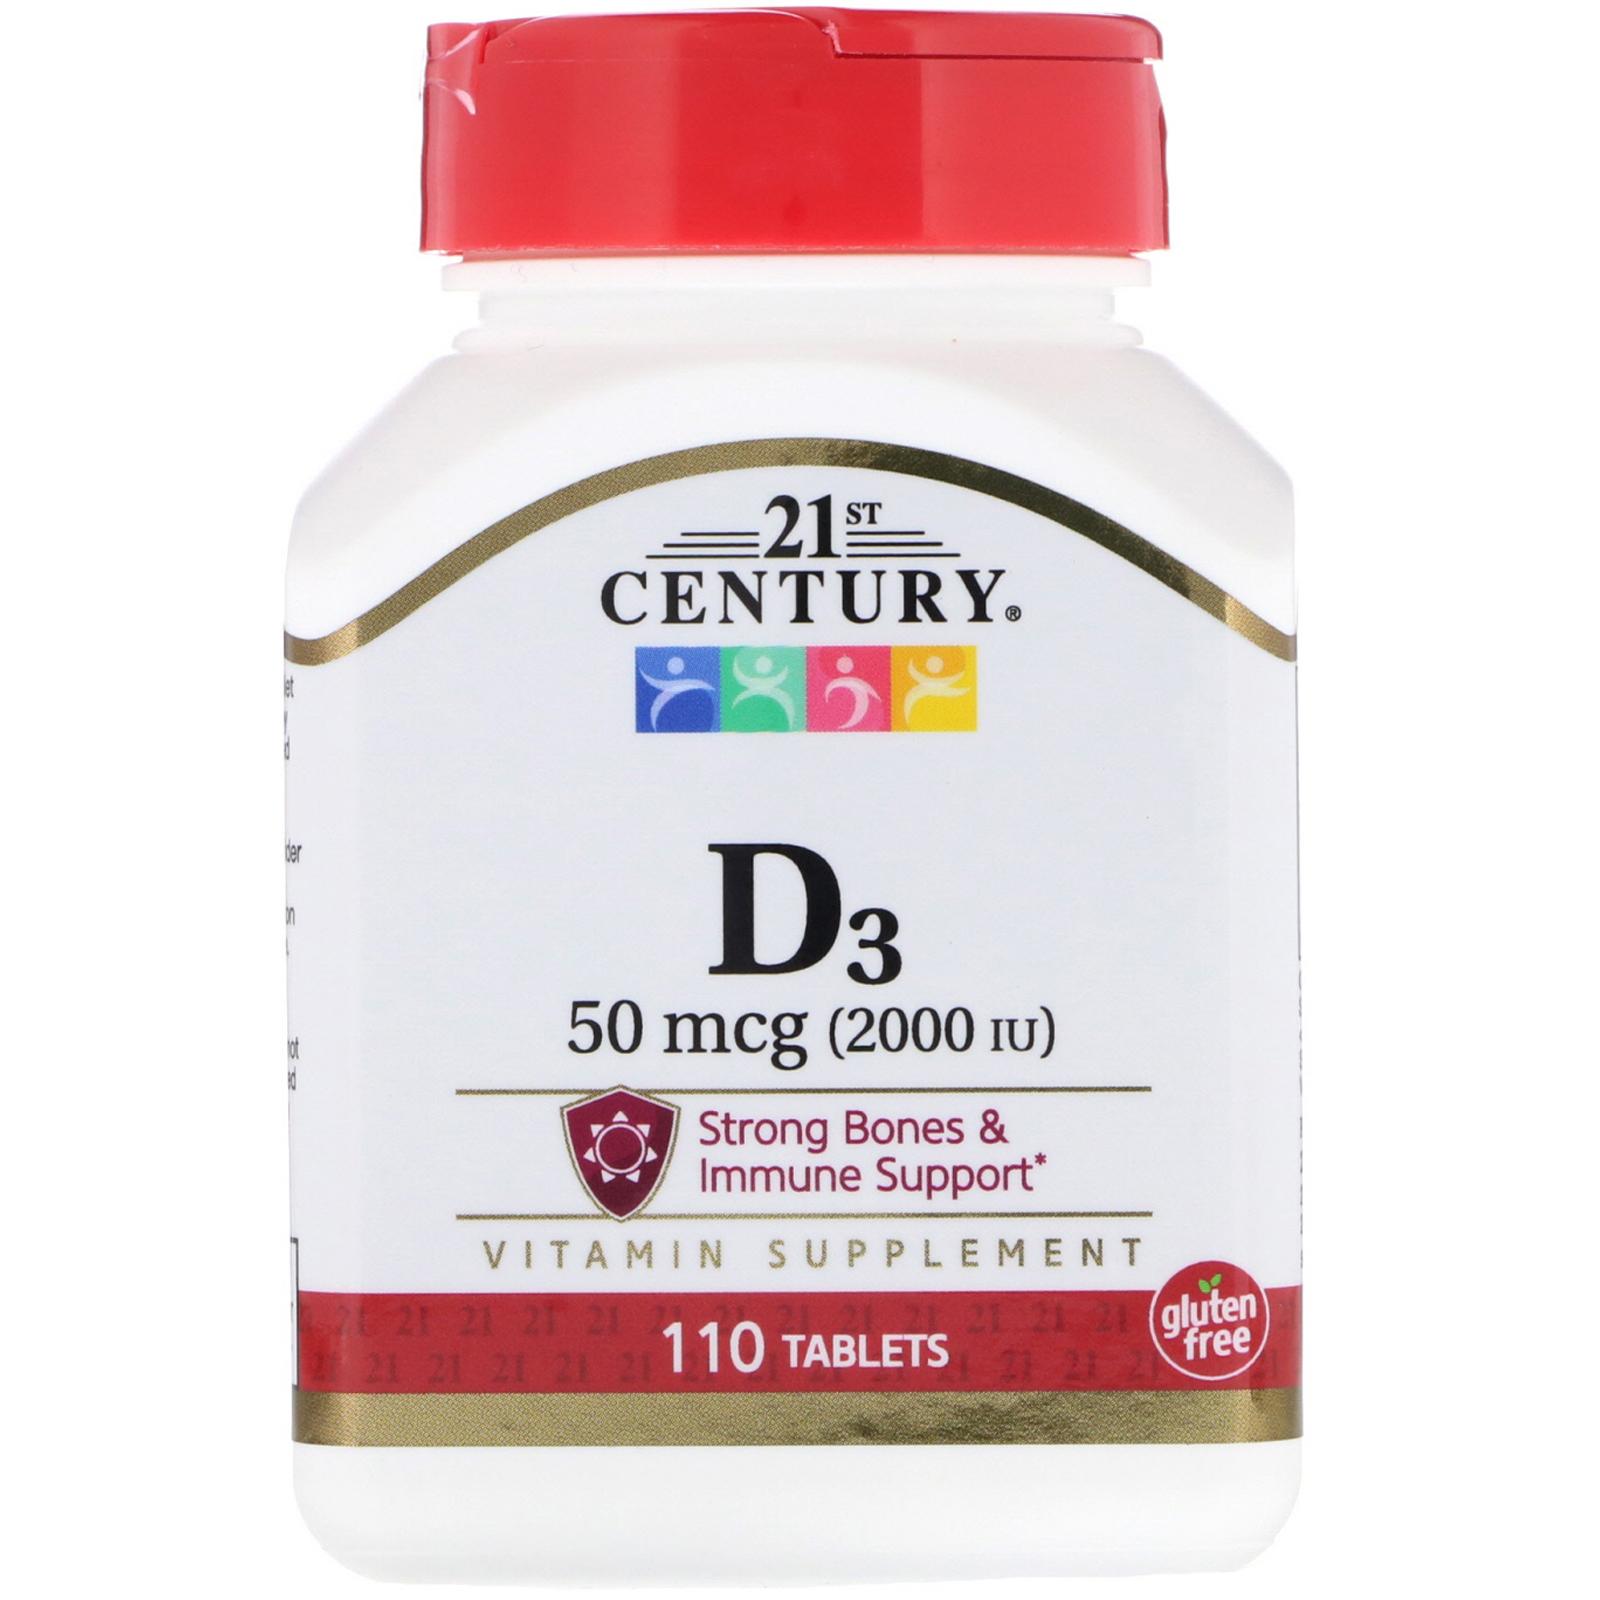 21st Century, Vitamin D3, 50 mcg (2,000 IU), 110 Tablets